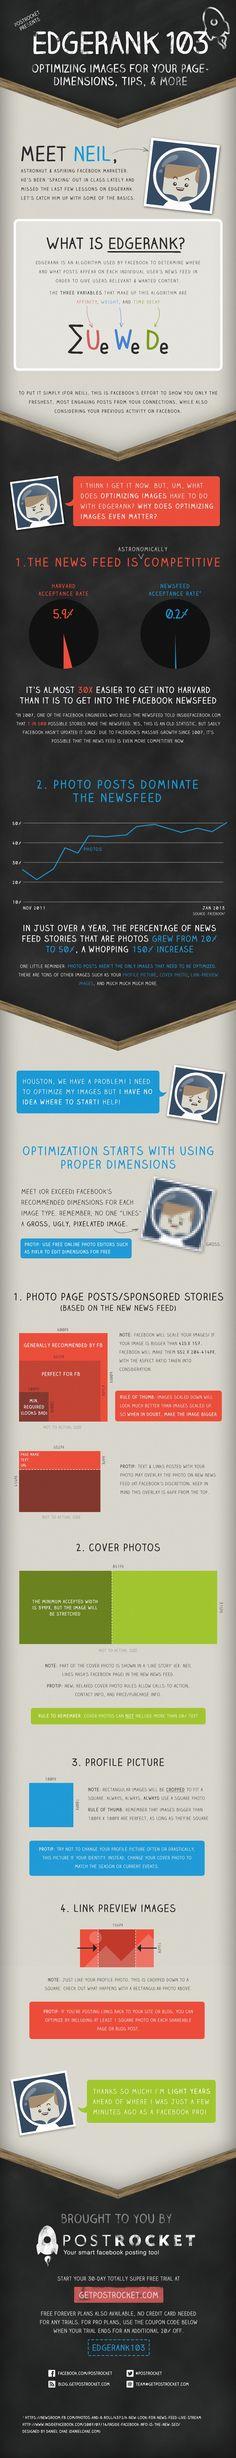 Facebook Bilder Infografik Komplett